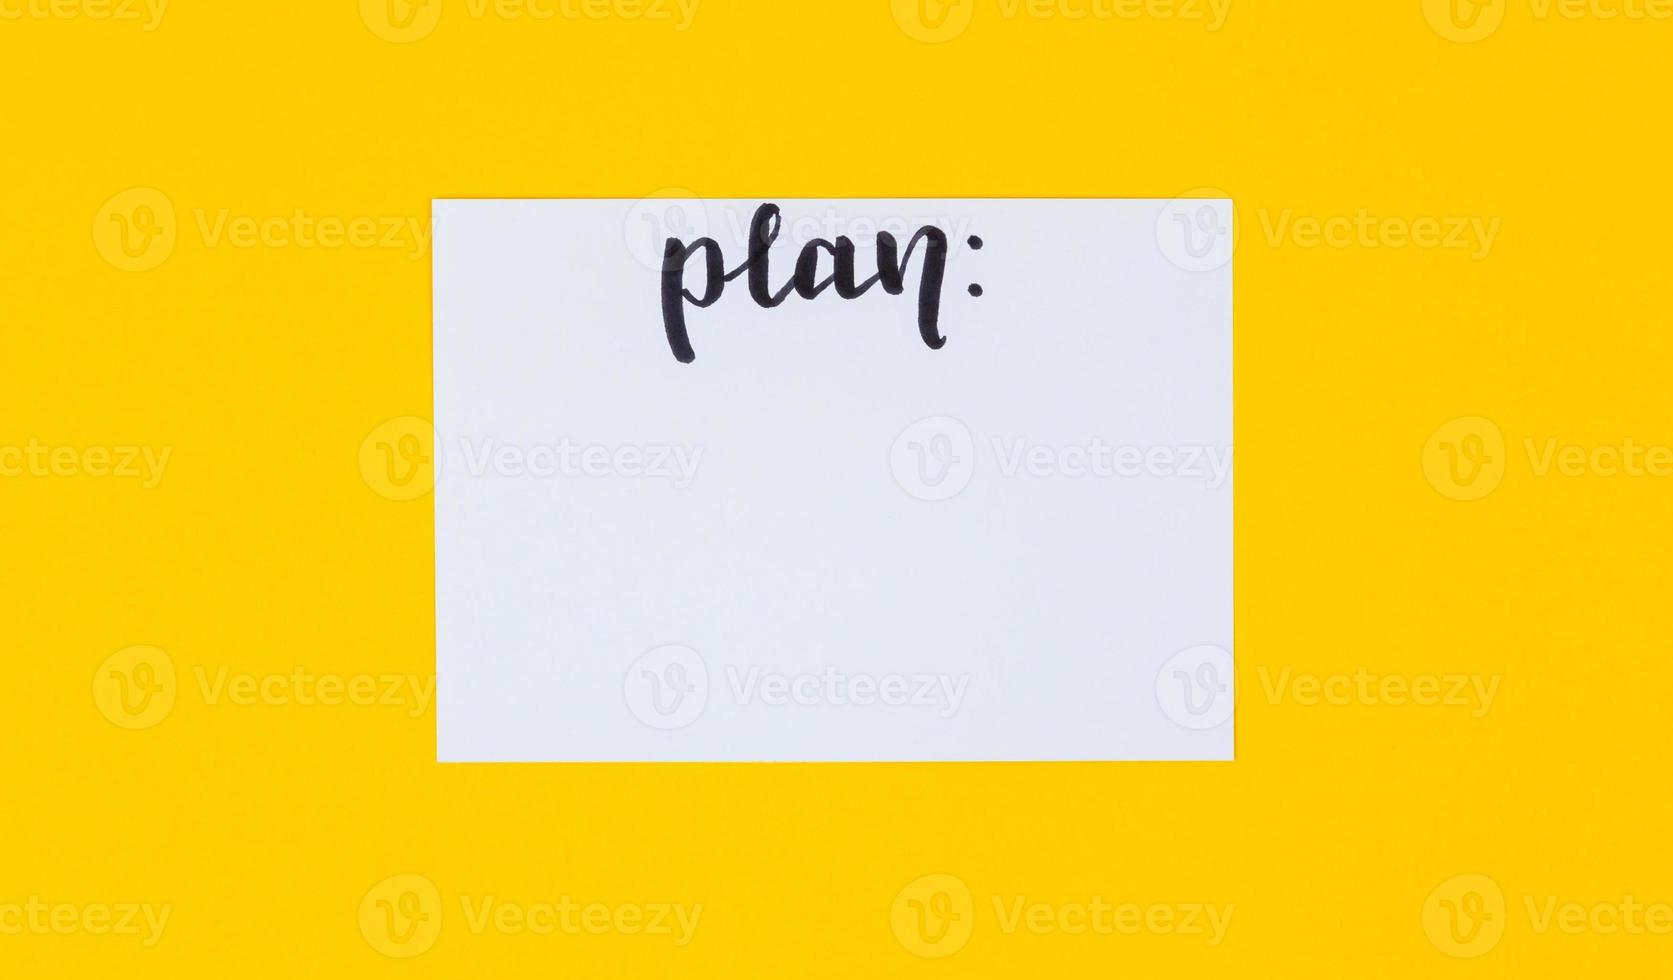 papel blanco en blanco e inscripción caligráfica negra del plan de palabra sobre fondo amarillo foto